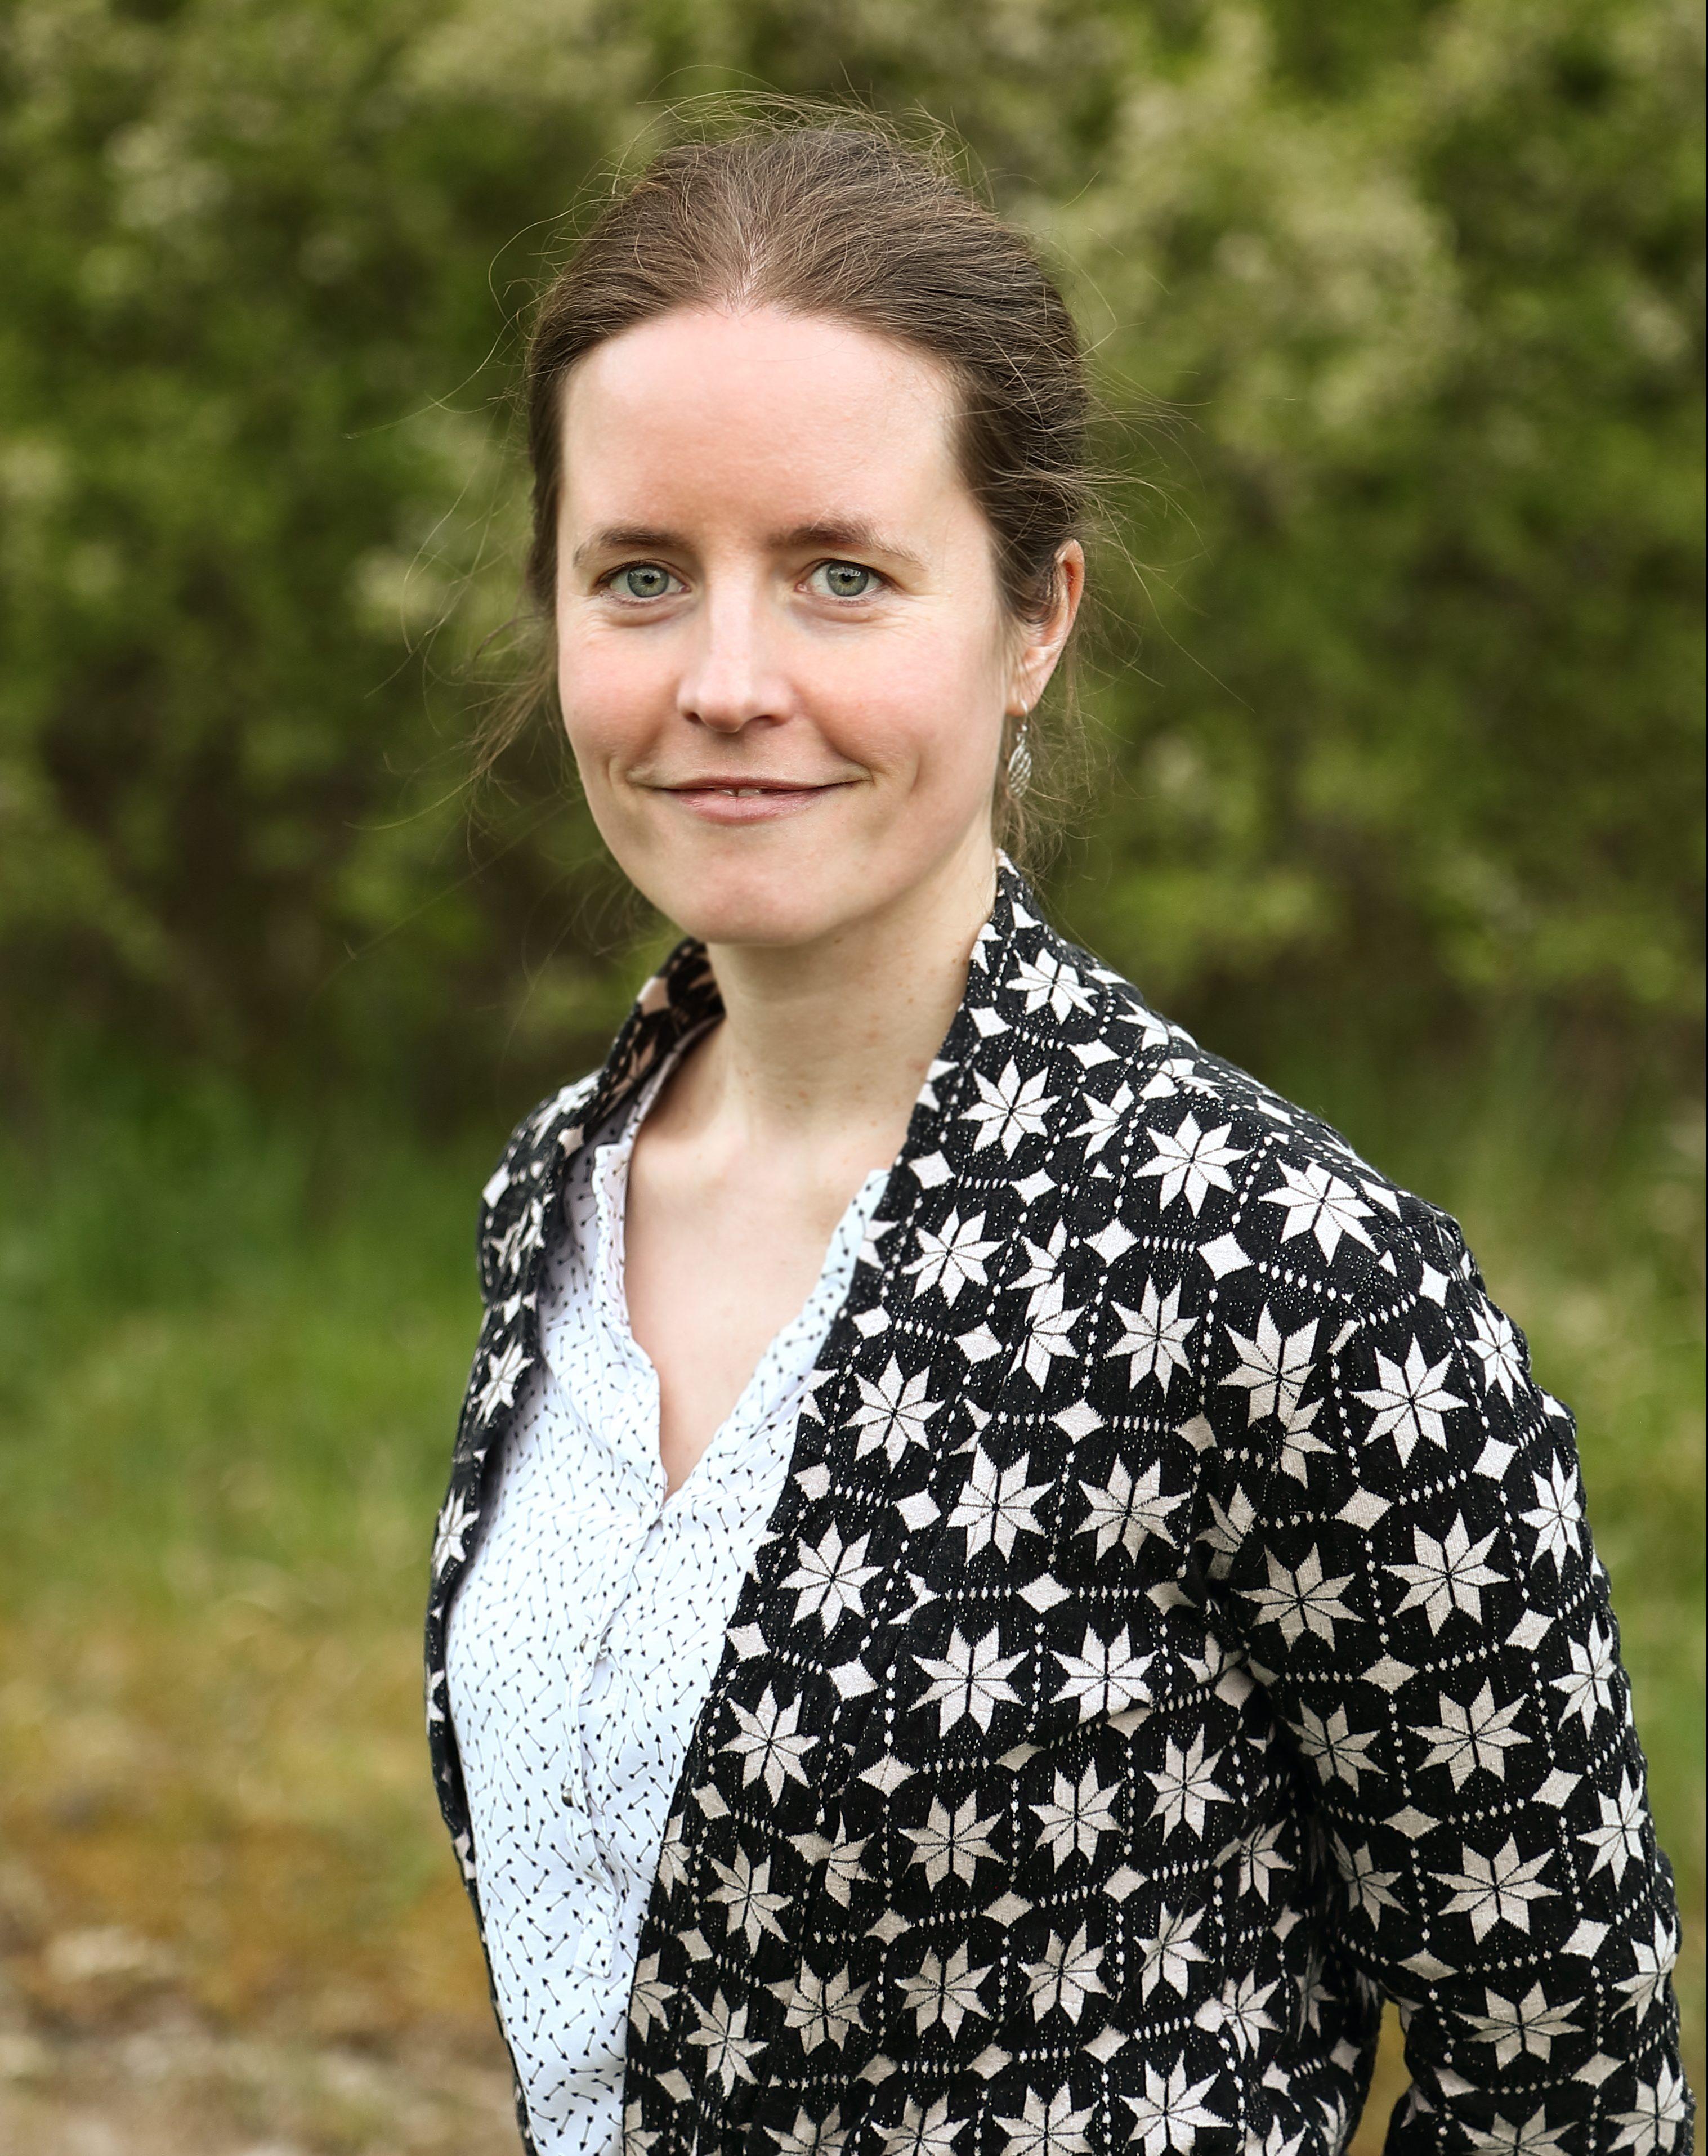 Cornelia Herzig - Approbierte Psychologische Psychotherapeutin Verhaltenstherapie in Trier